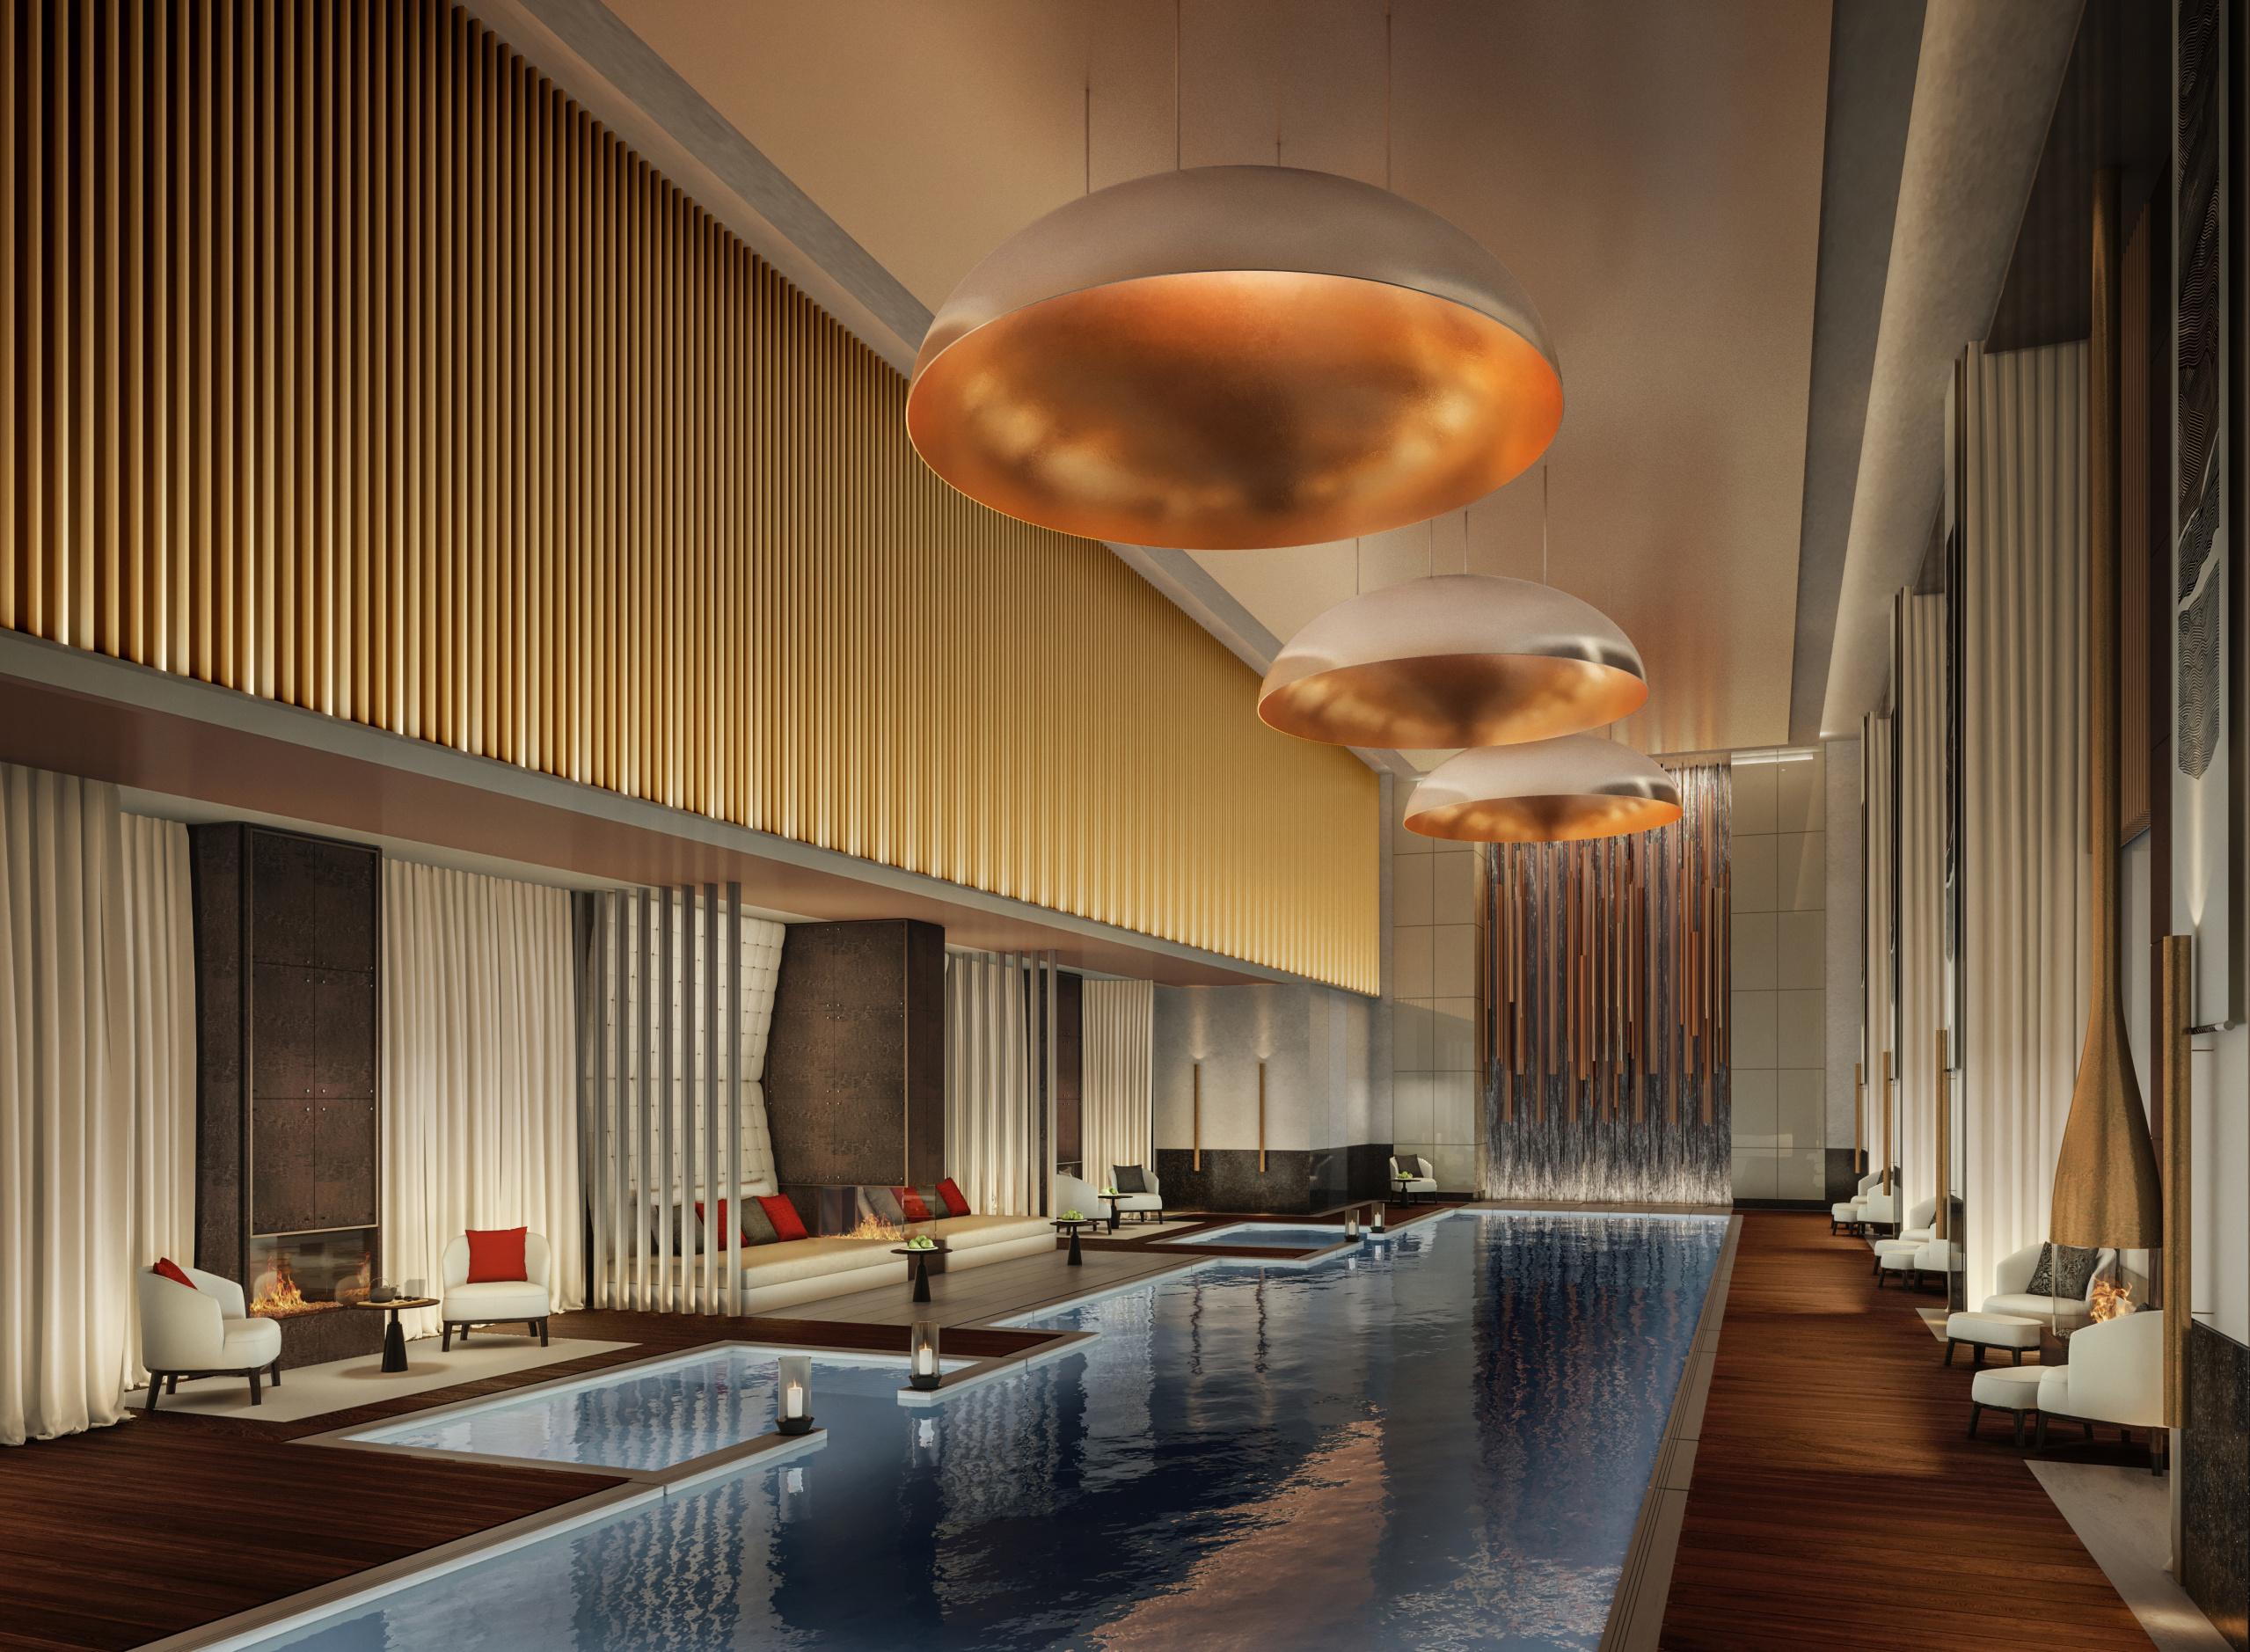 Aman New York - Spa Pool